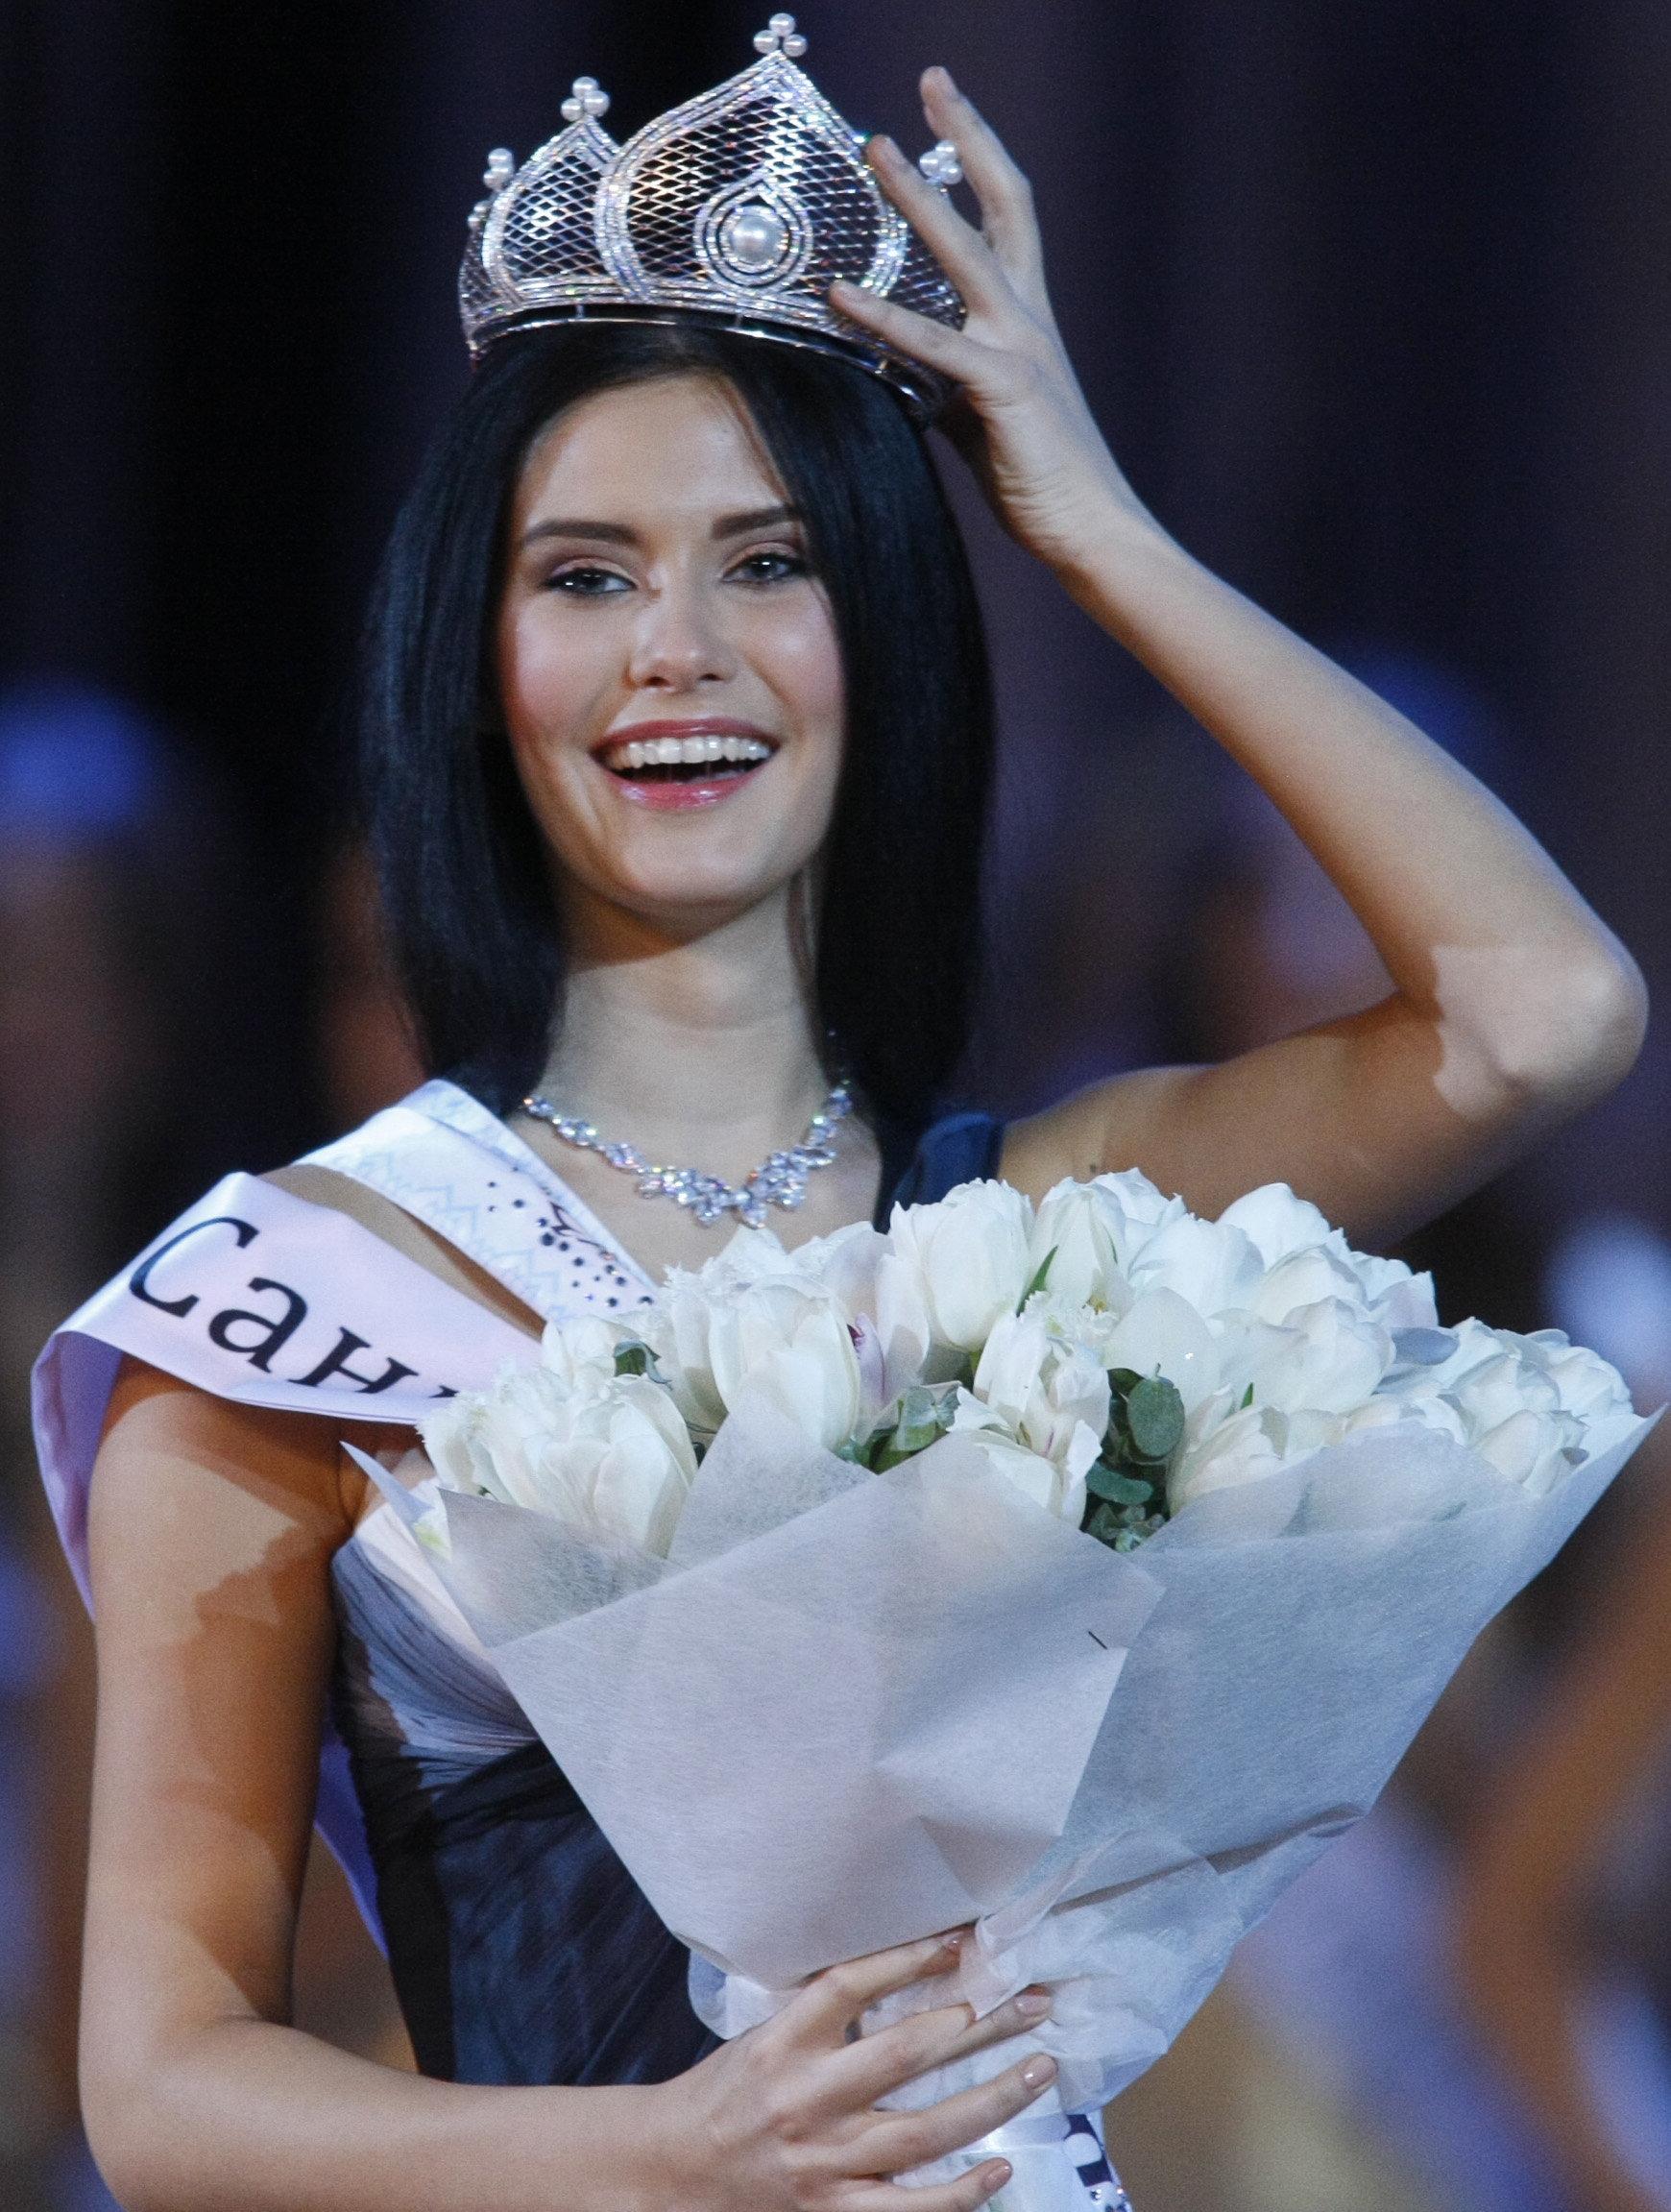 Sophia Roudieva